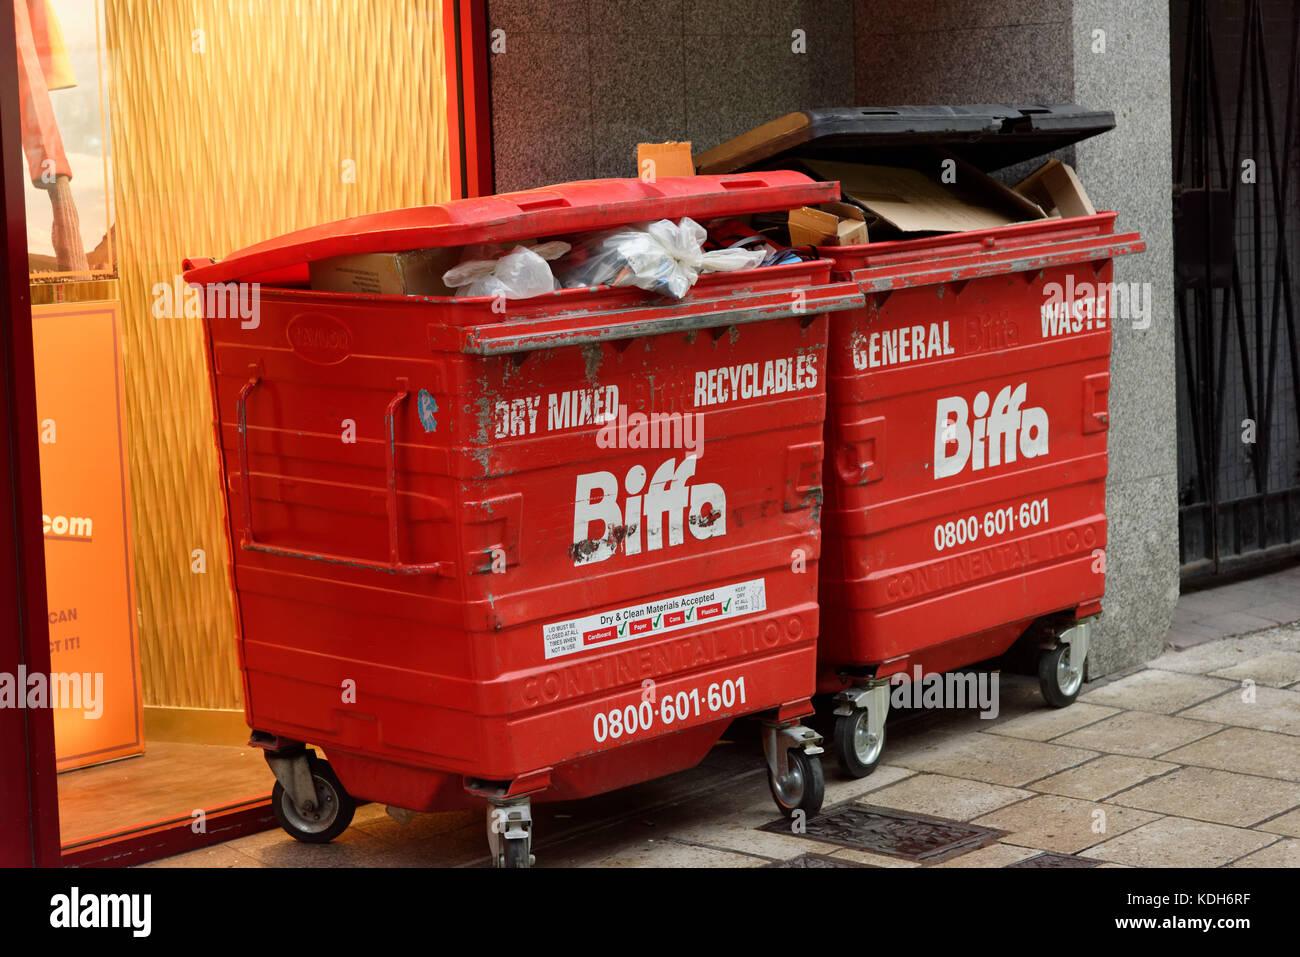 biffa bins bin collection rubbish waste management dumpster trash - Stock Image